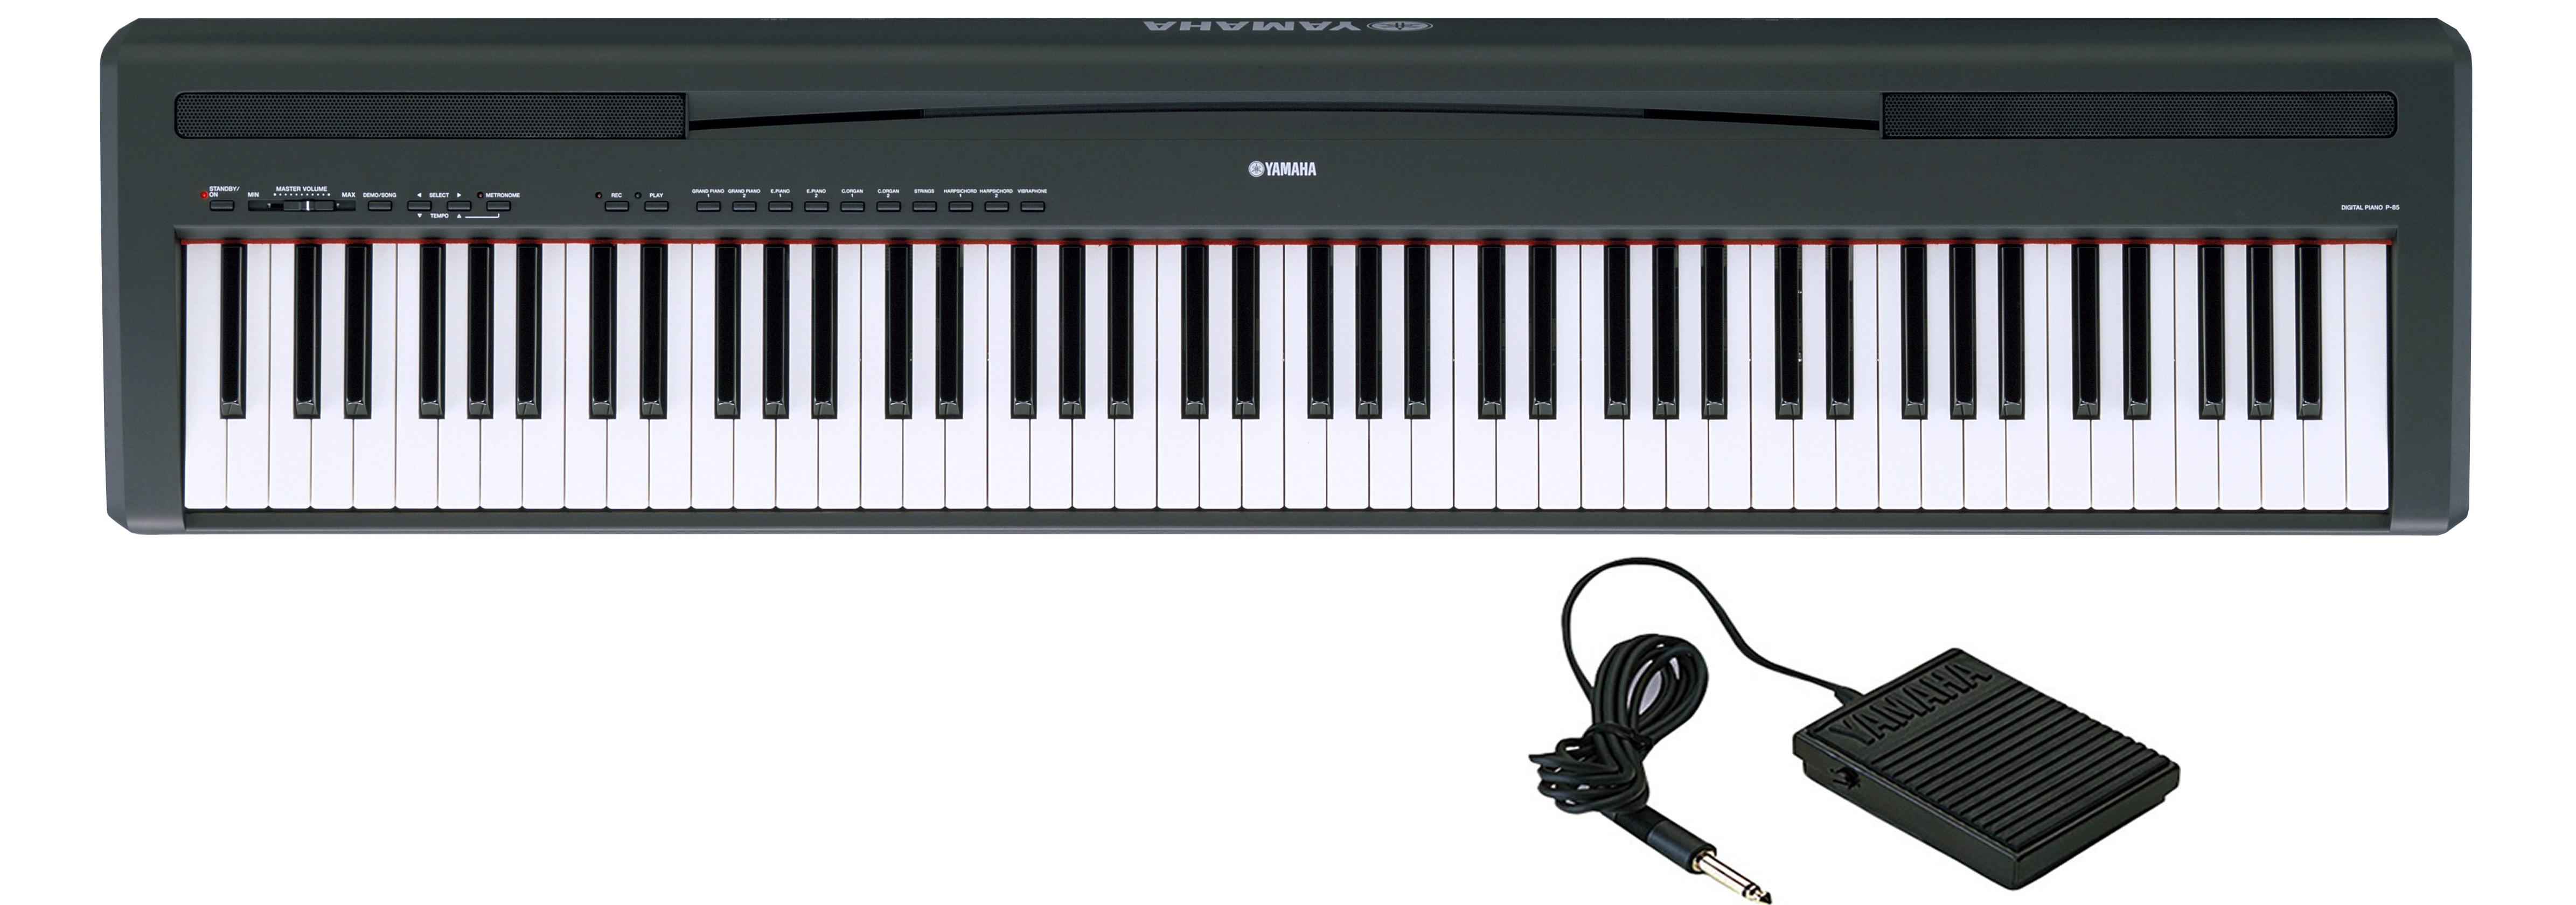 Yamaha p 85 image 457530 audiofanzine for Yamaha digital piano philippines